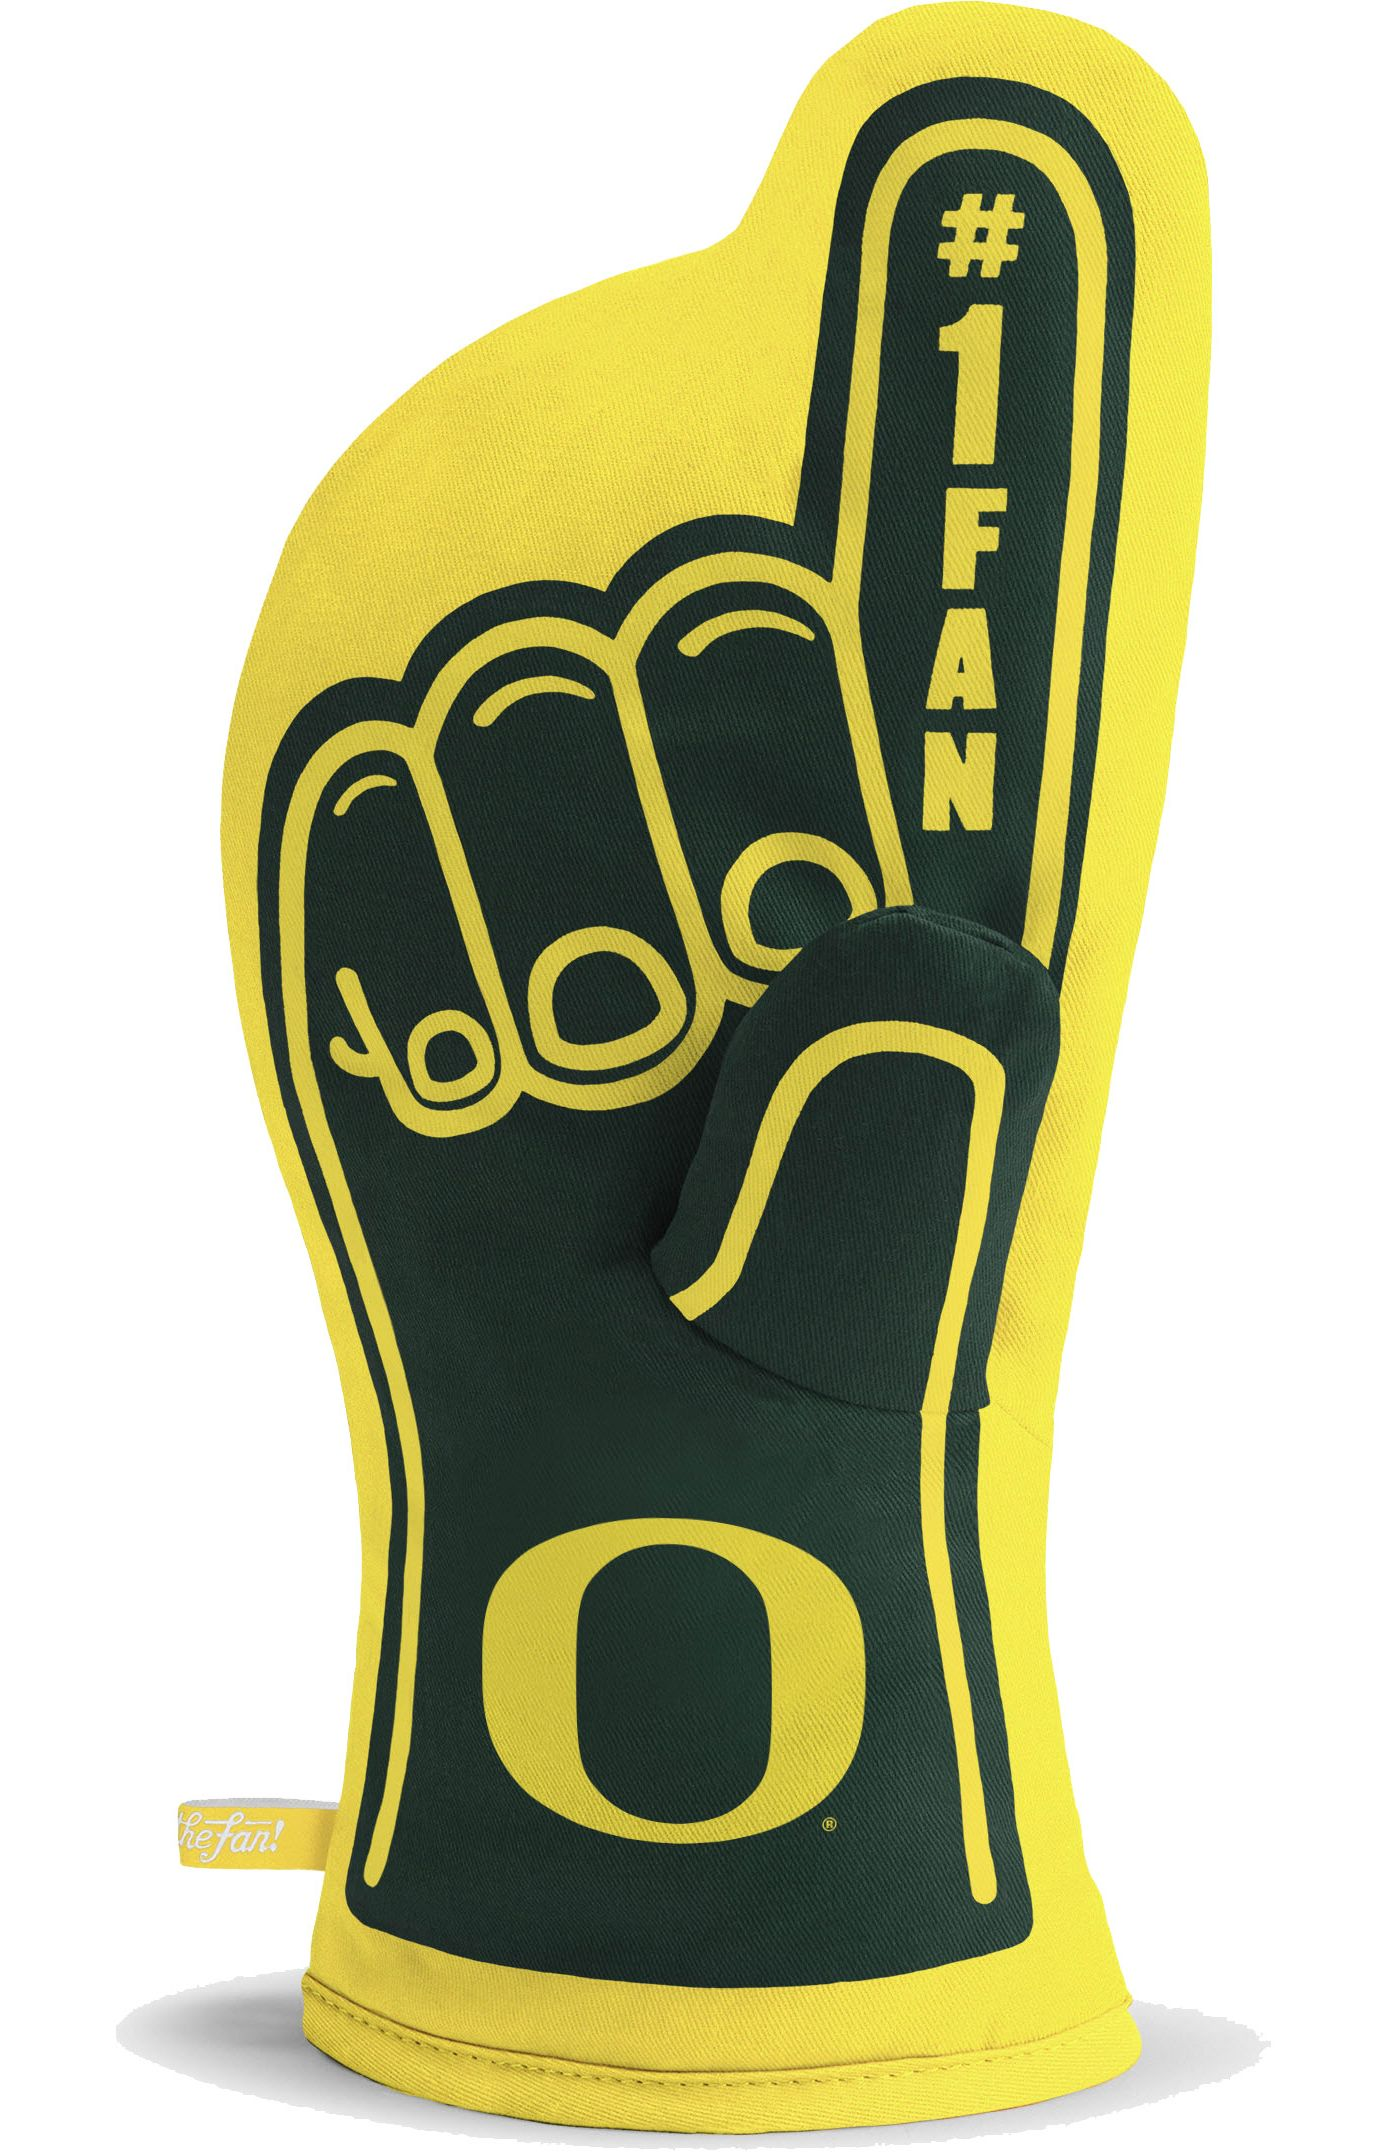 You The Fan Oregon Ducks #1 Oven Mitt